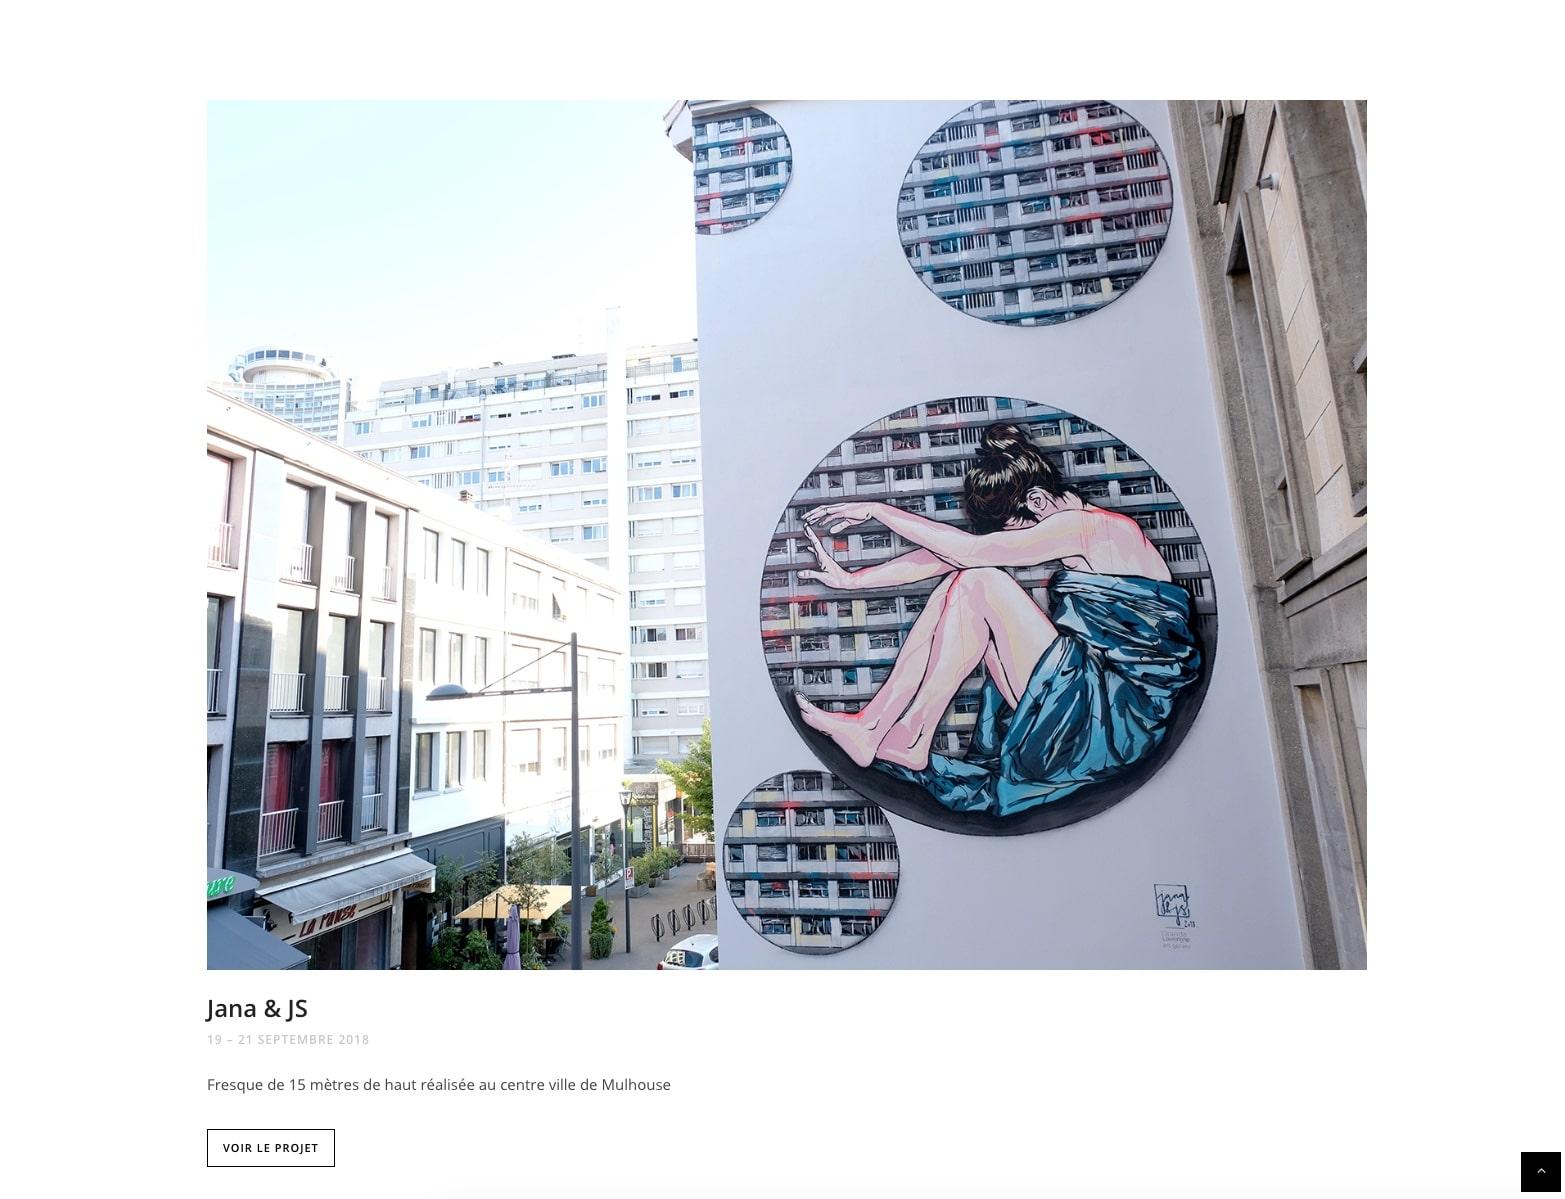 Orlinda, Street art, dessin sur Mur à Mulhouse, cliente karedess Agency